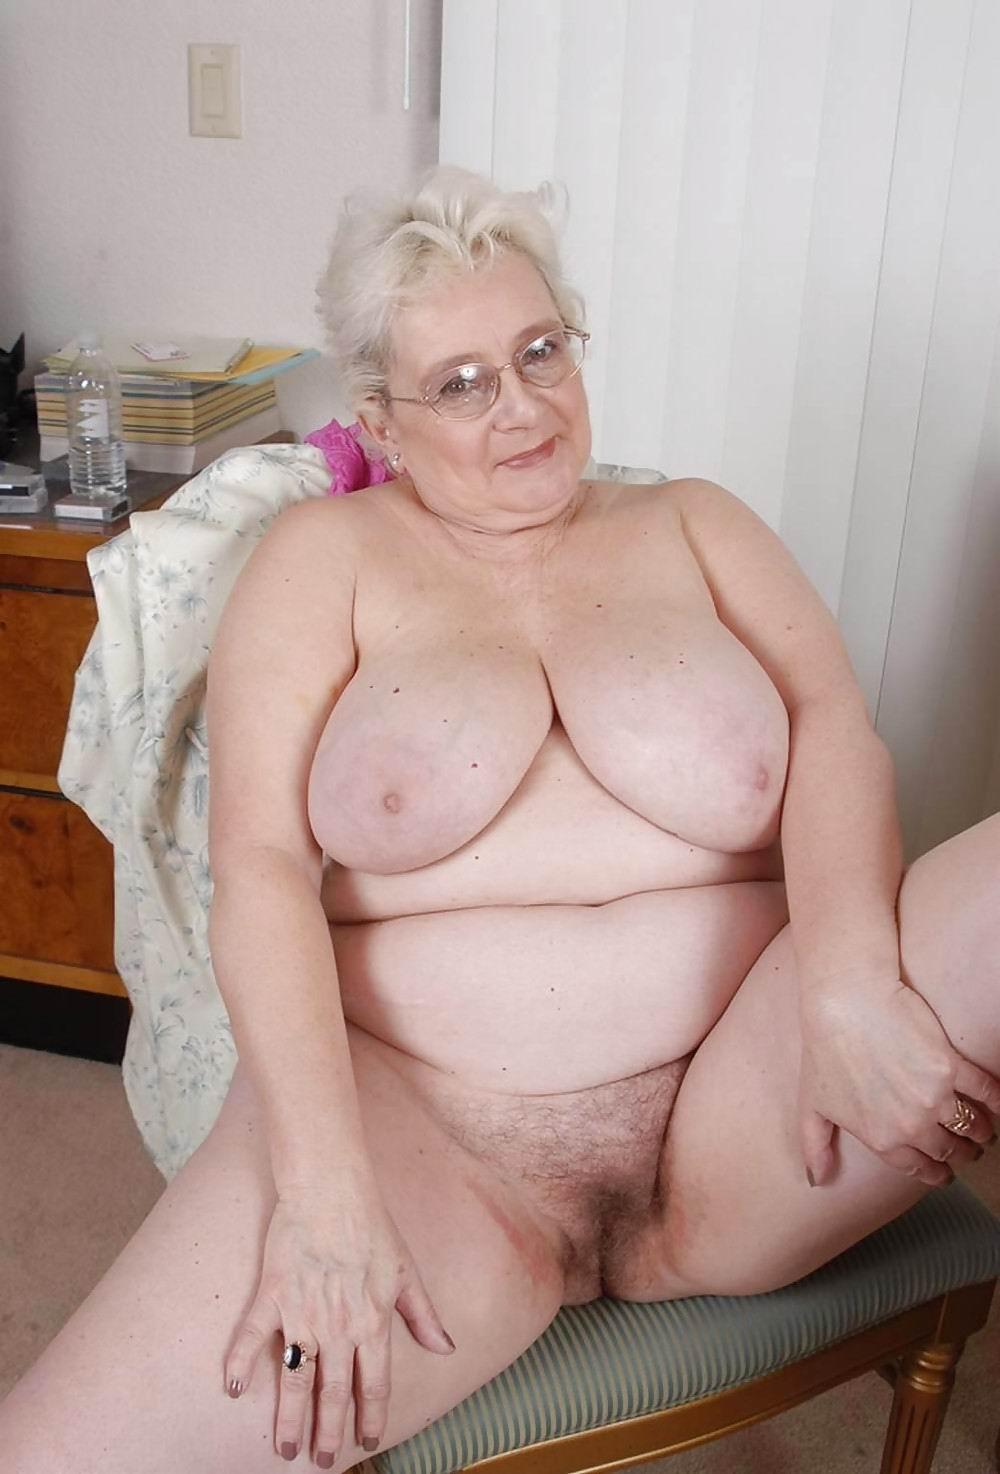 Goose recommendet granny women orgy